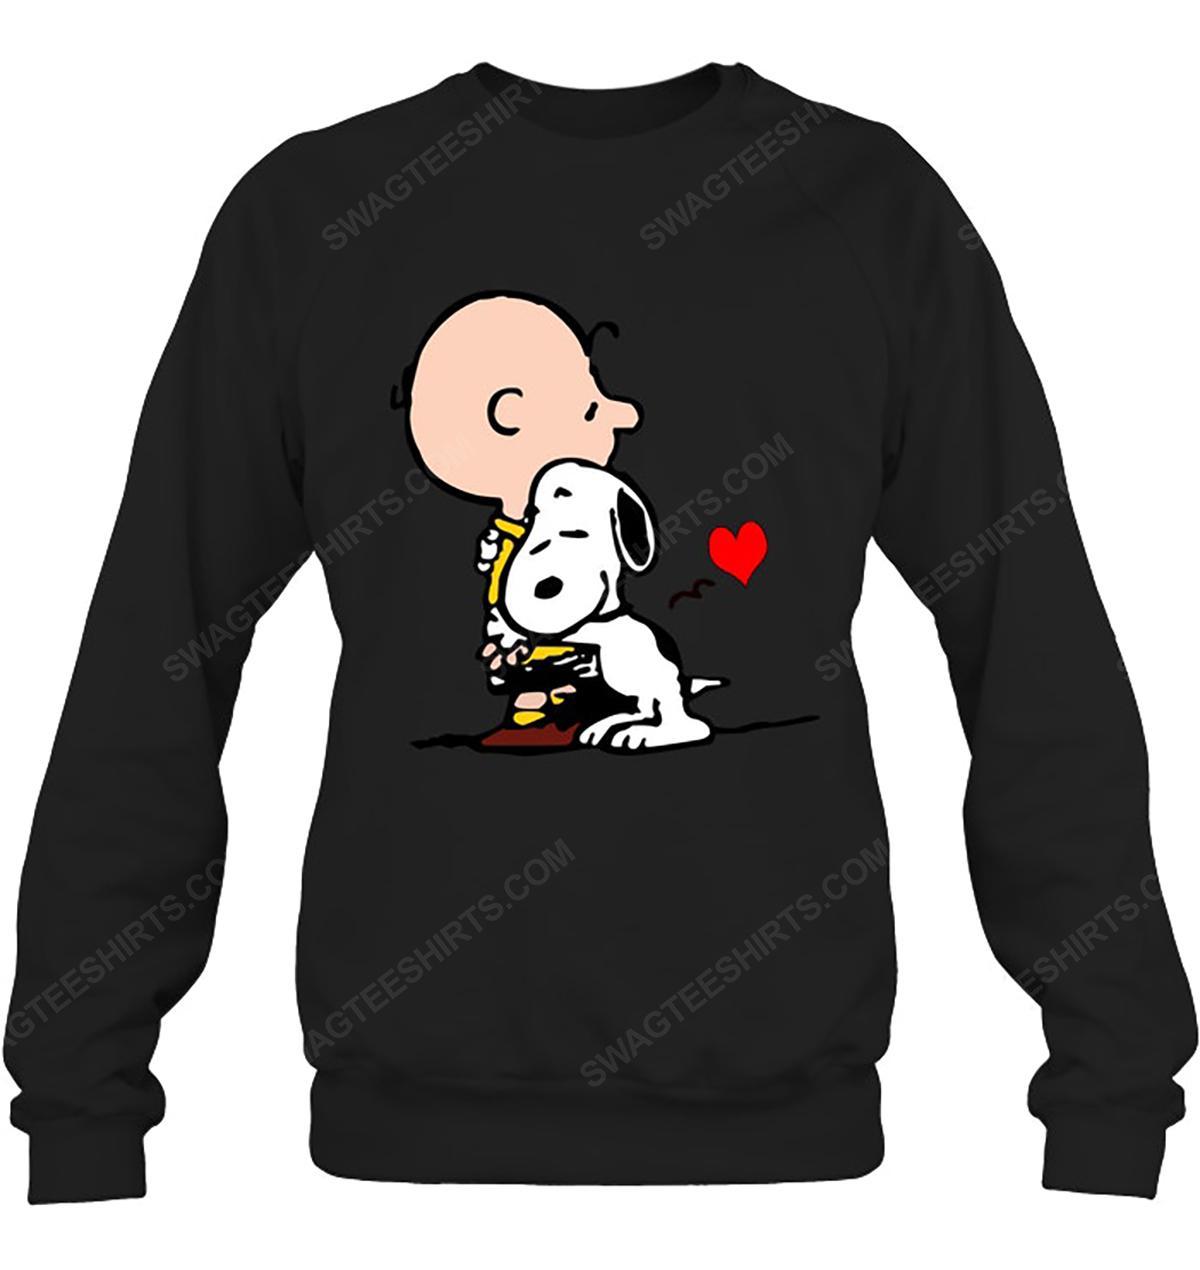 The peanuts snoopy and charlie brown love sweatshirt 1